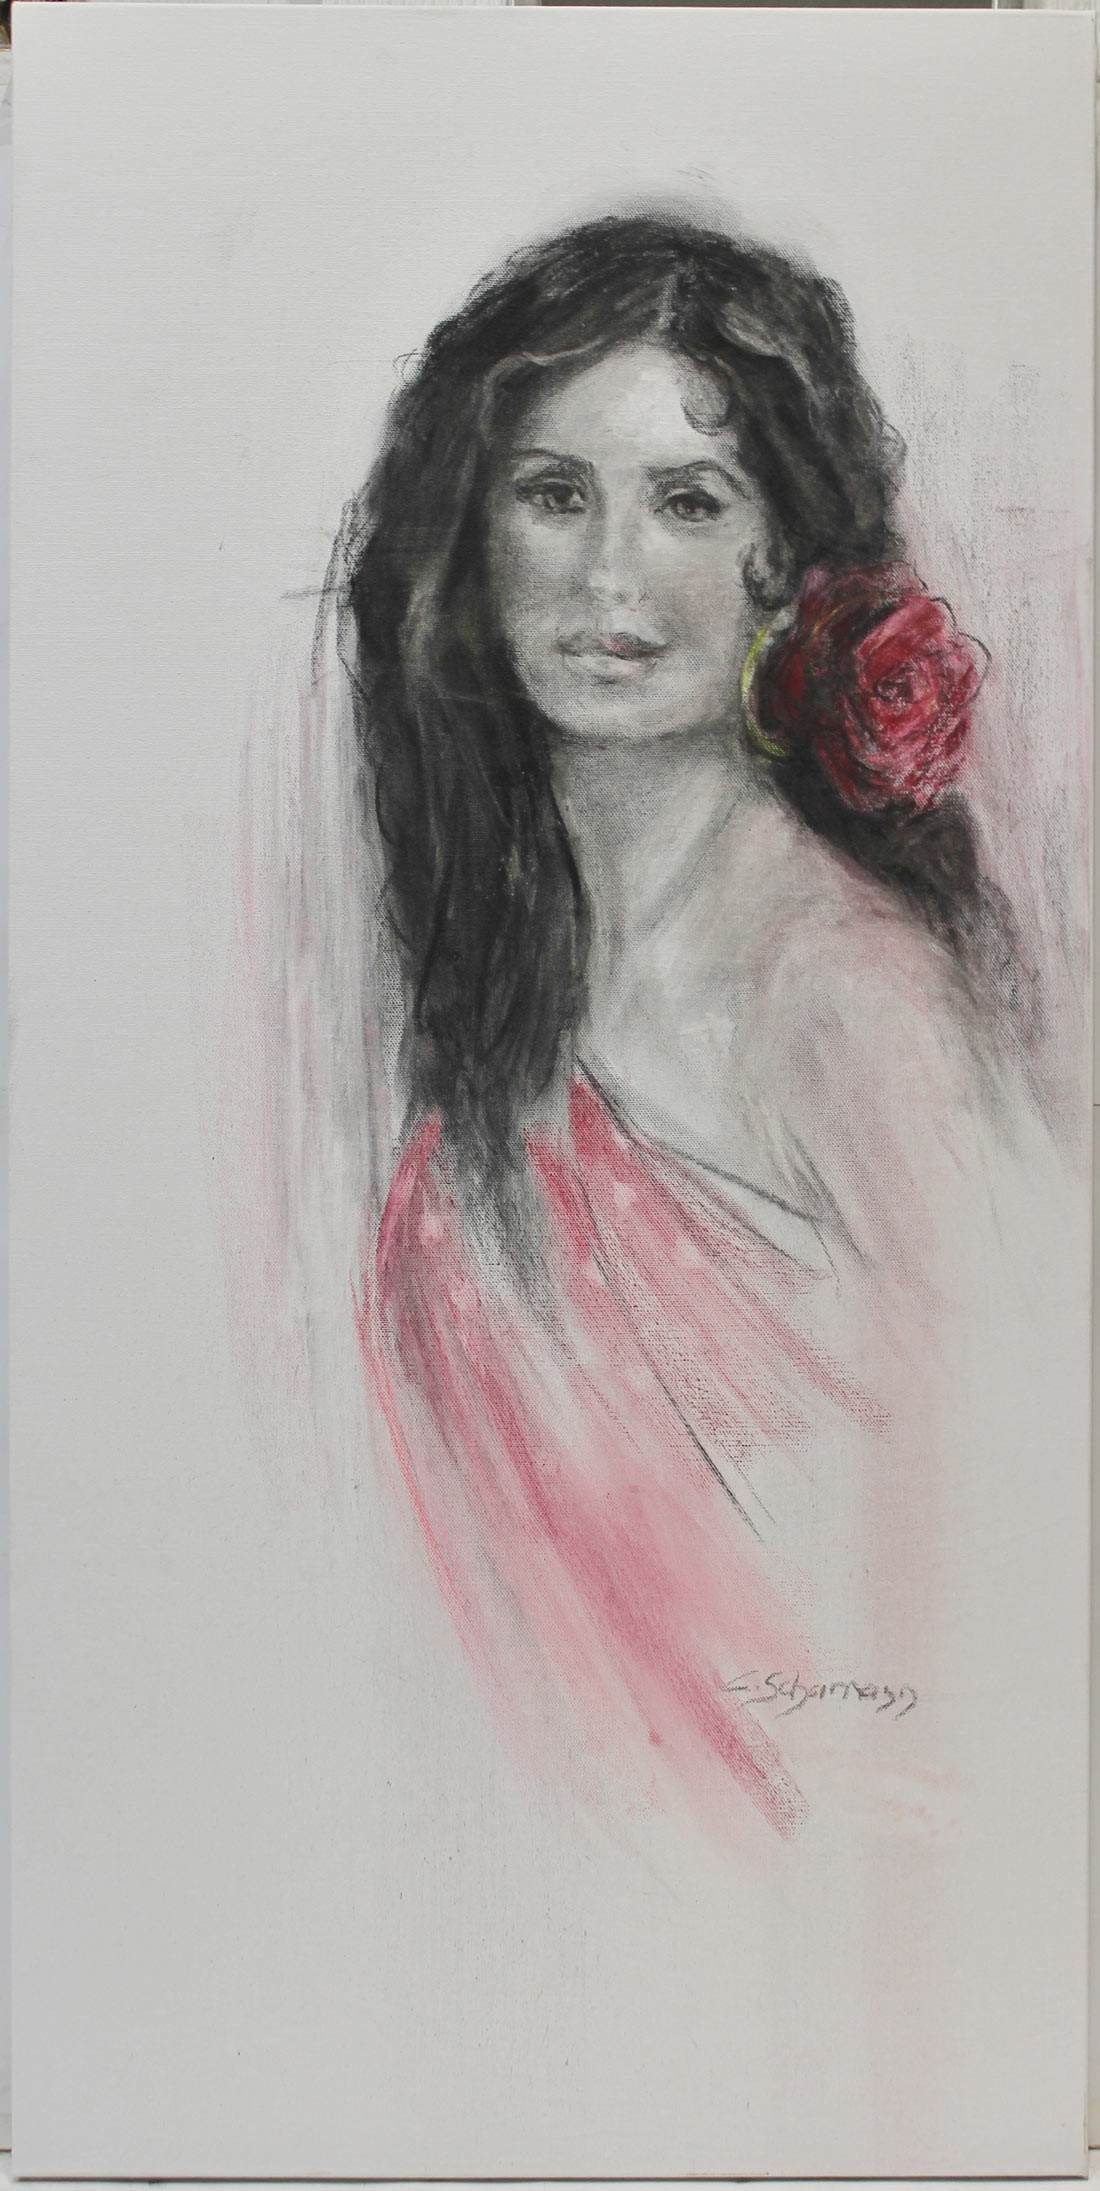 Carmen Schamann: La chica de la flor en el pelo